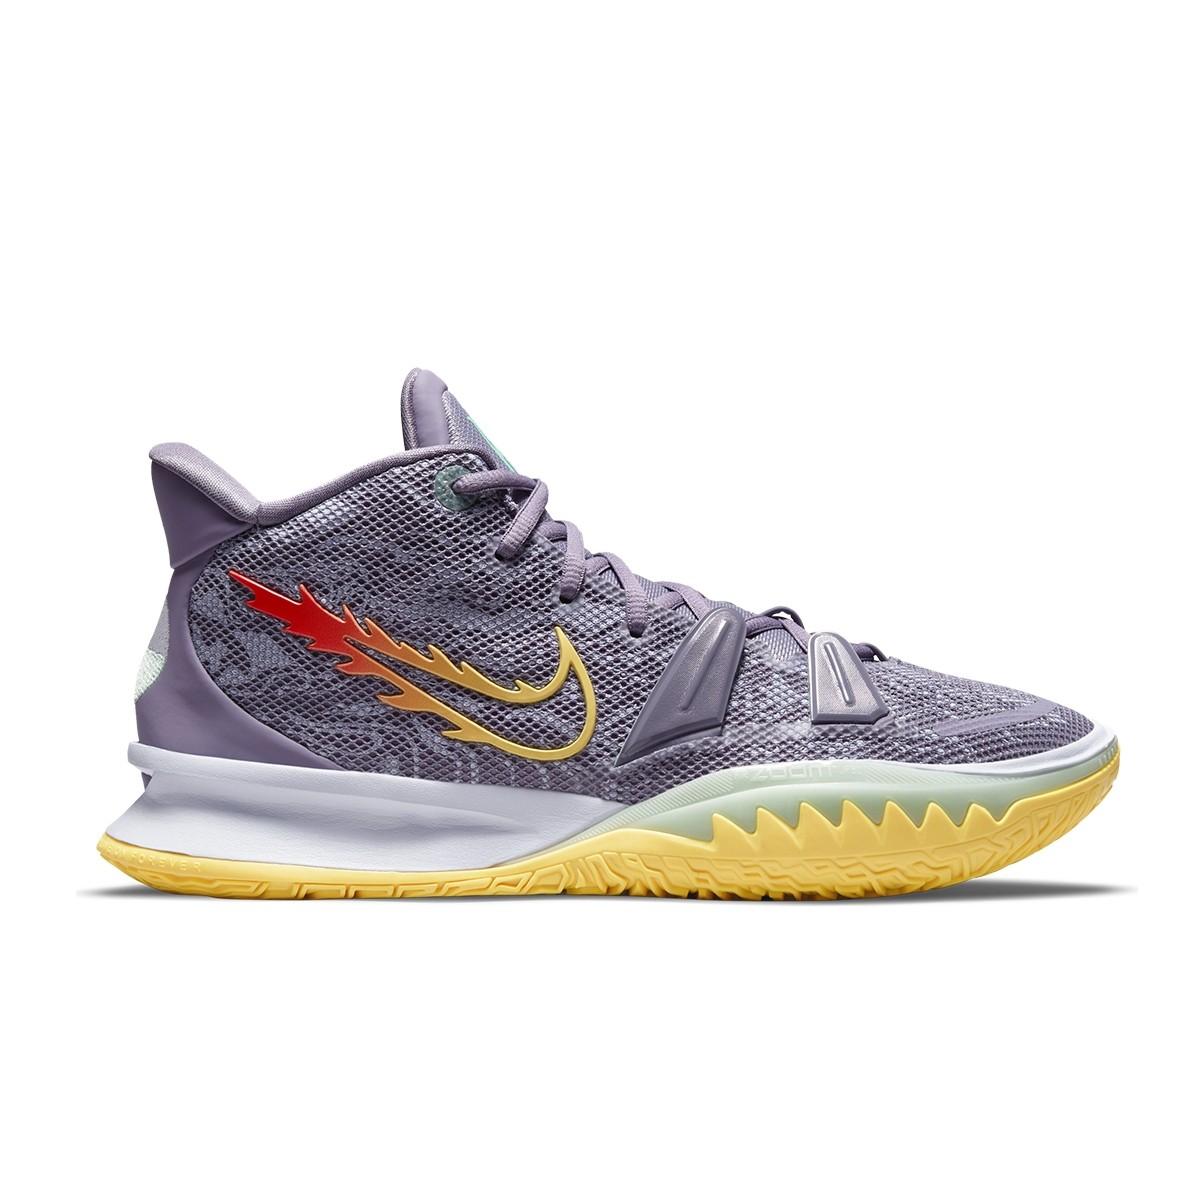 Nike Kyrie 7 'Daybreak'